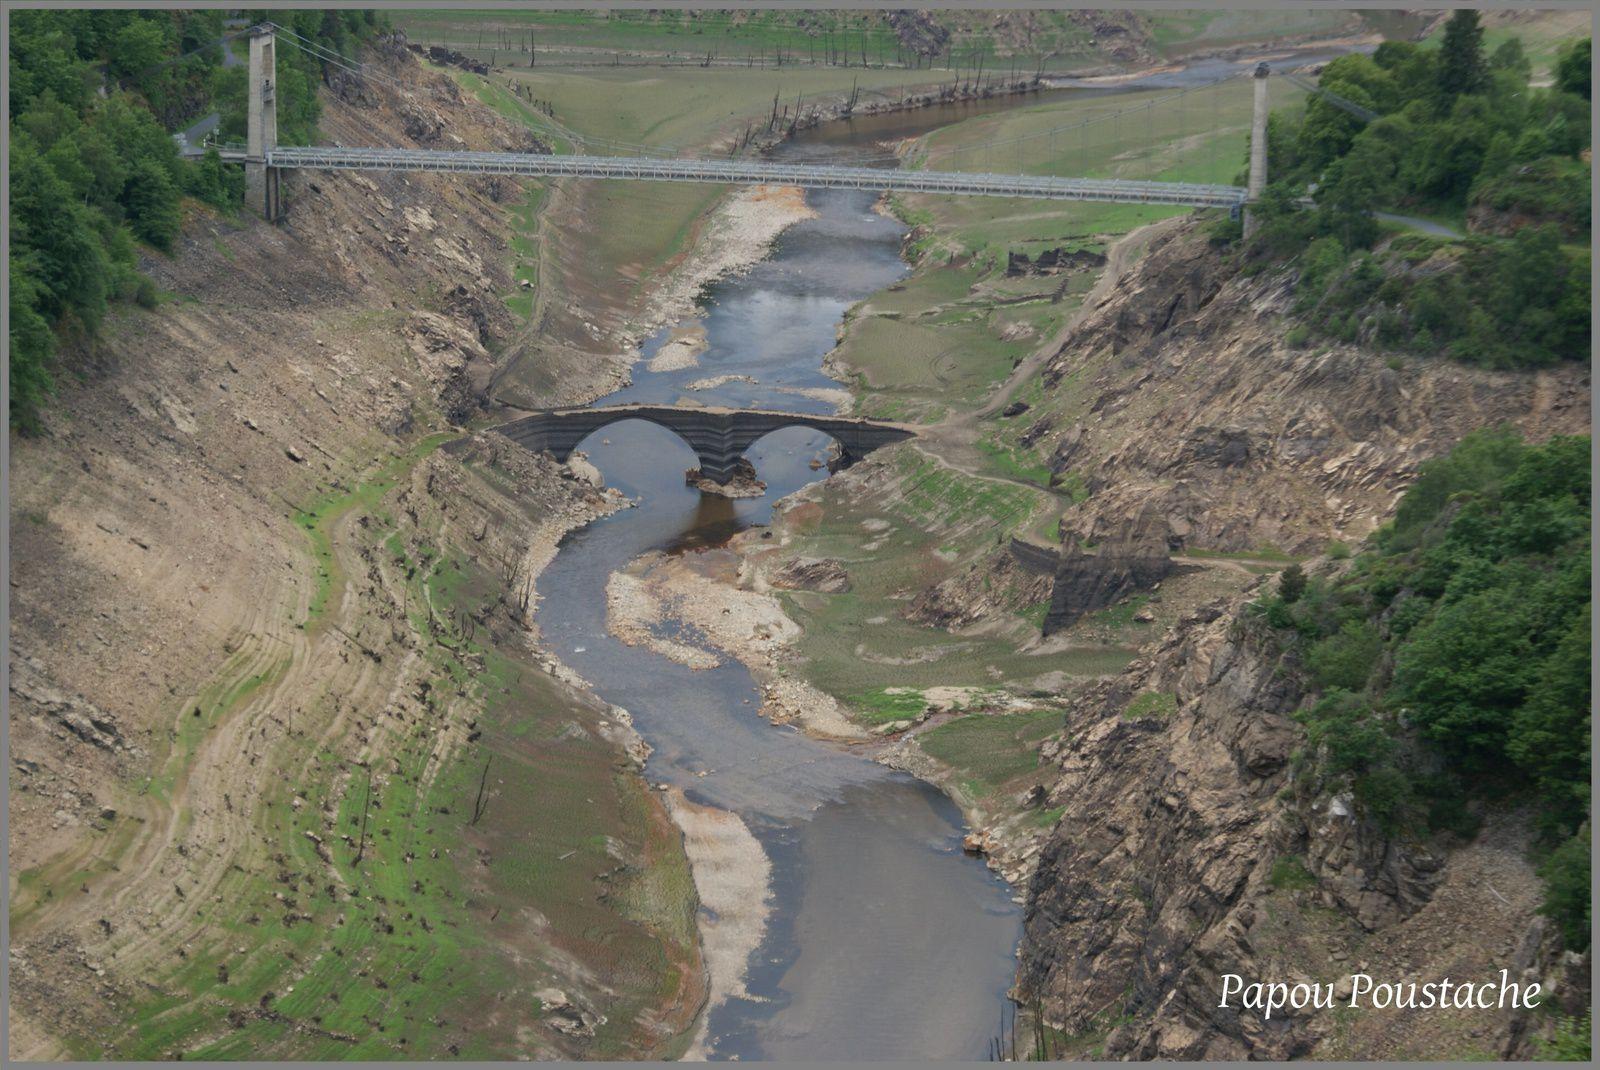 La construction du barrage de Sarrans